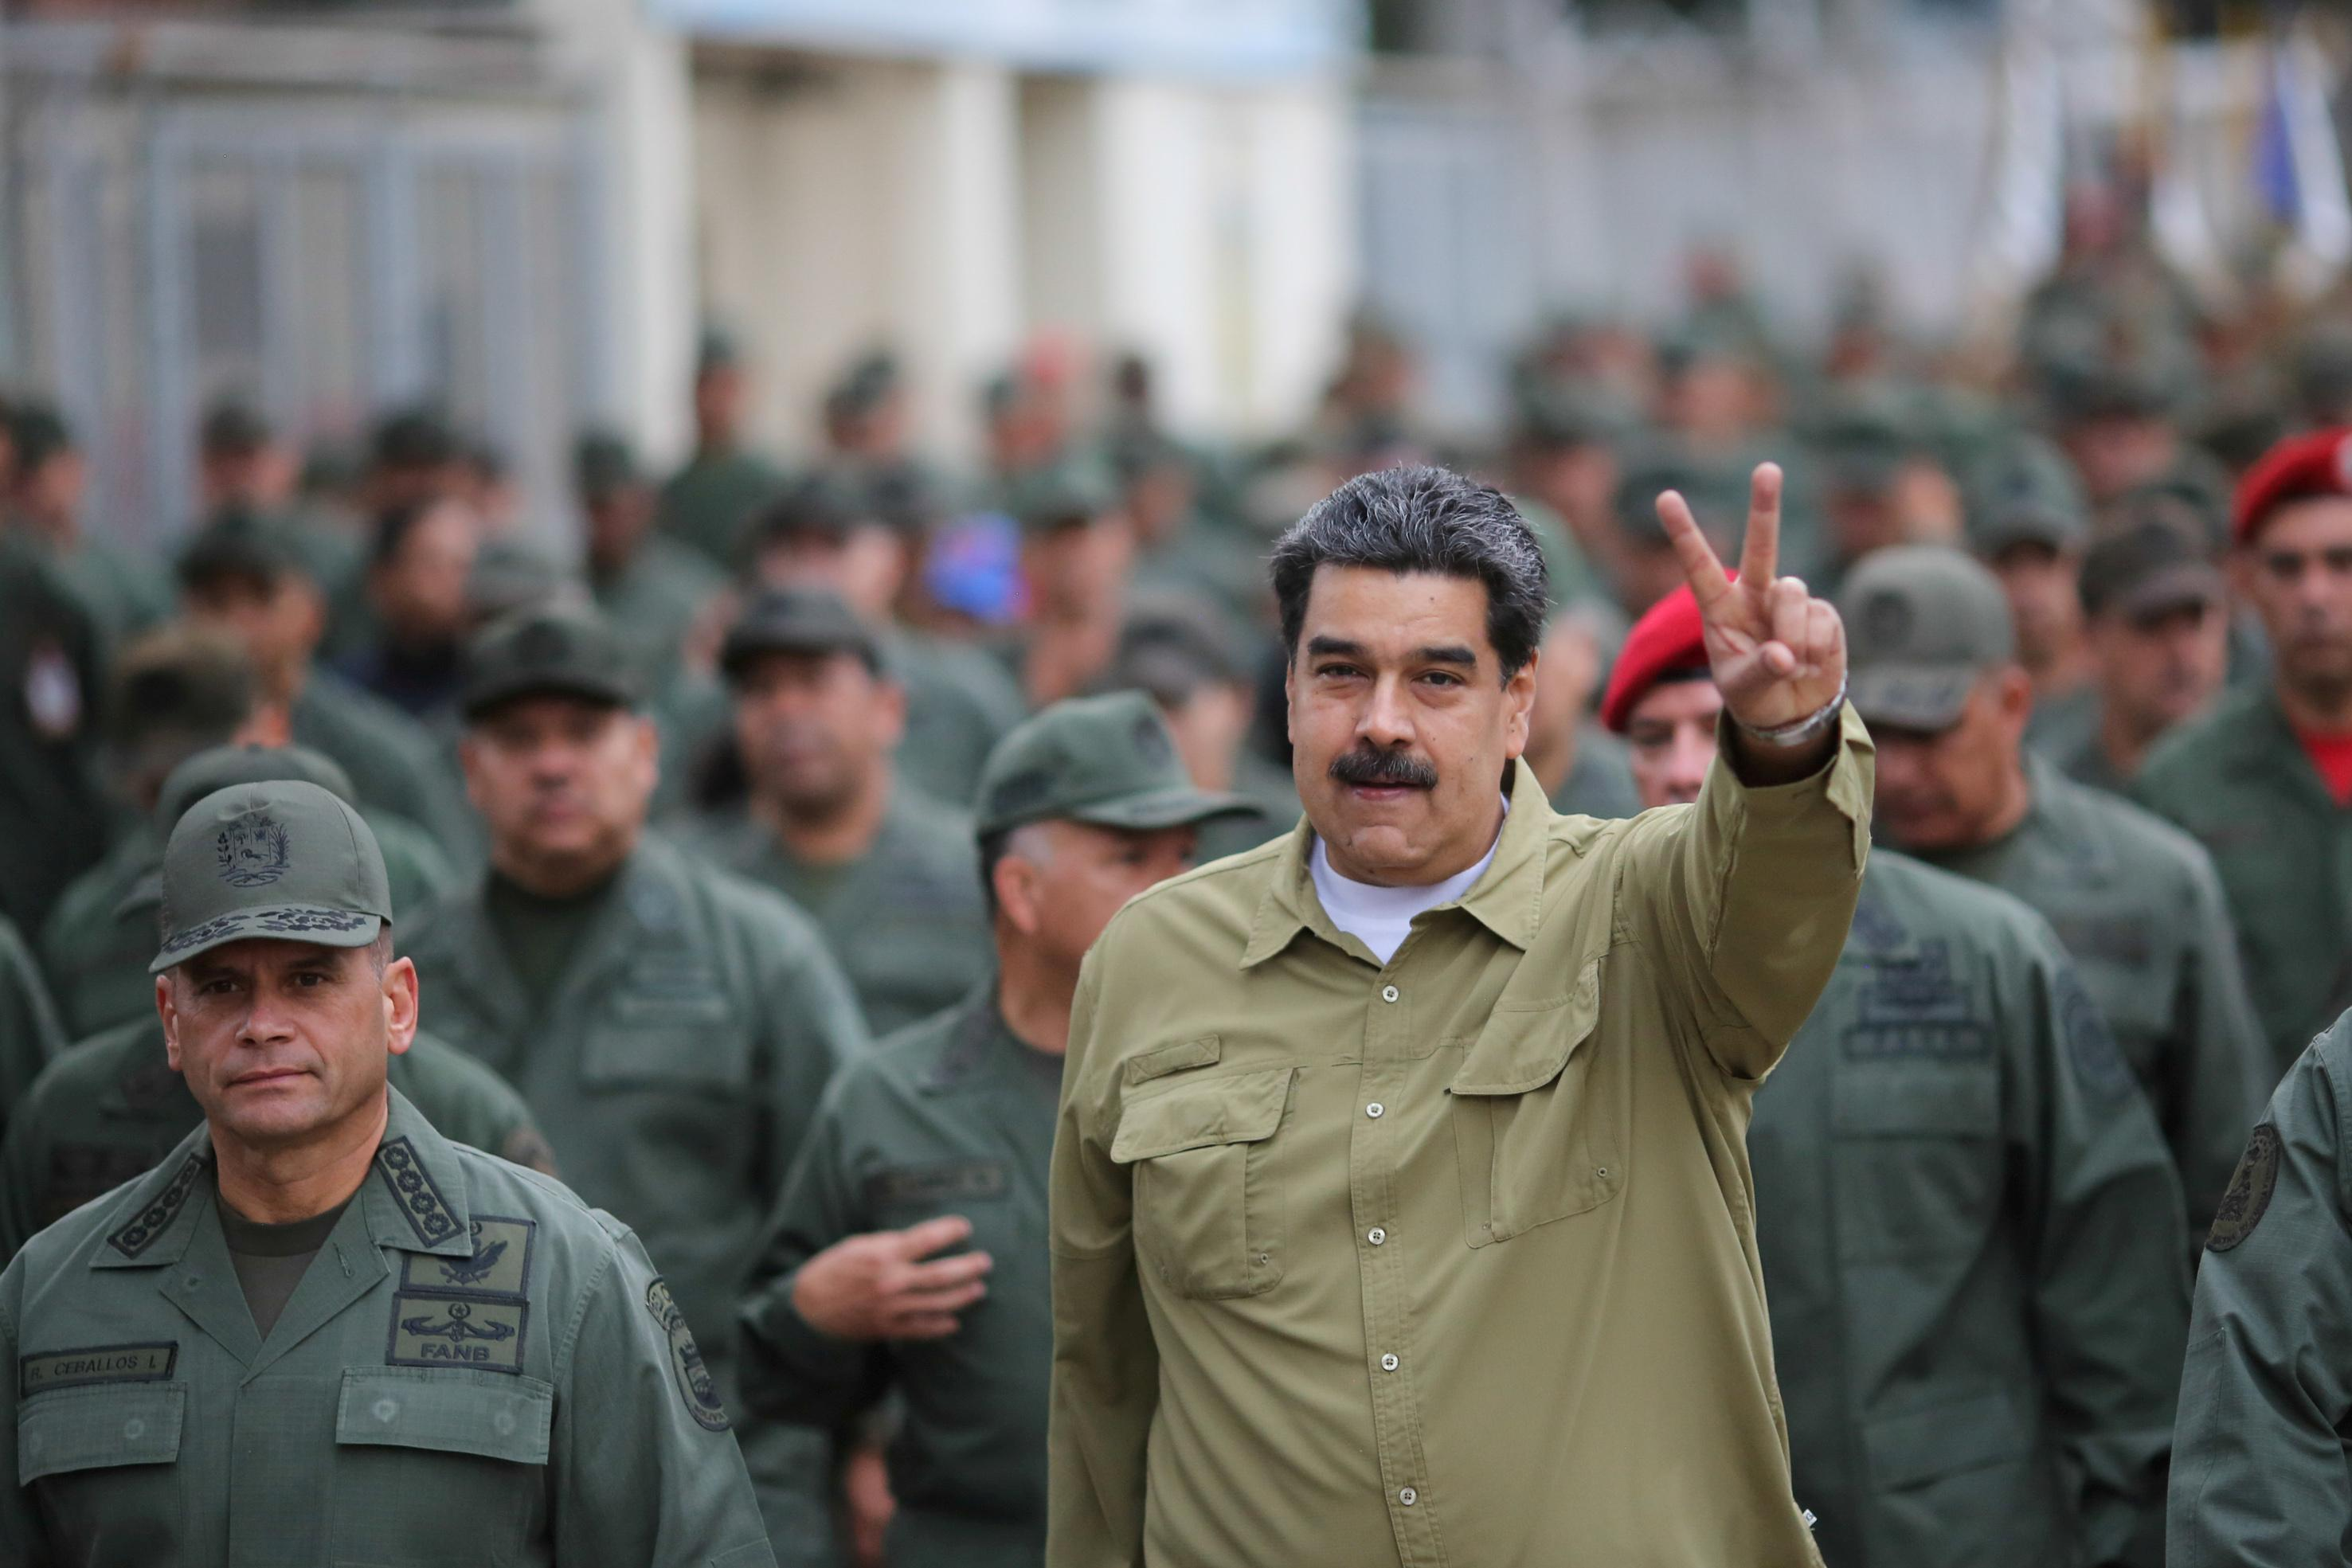 Venezuela's Maduro says he will skip U.N., but envoys will slam U.S. sanctions